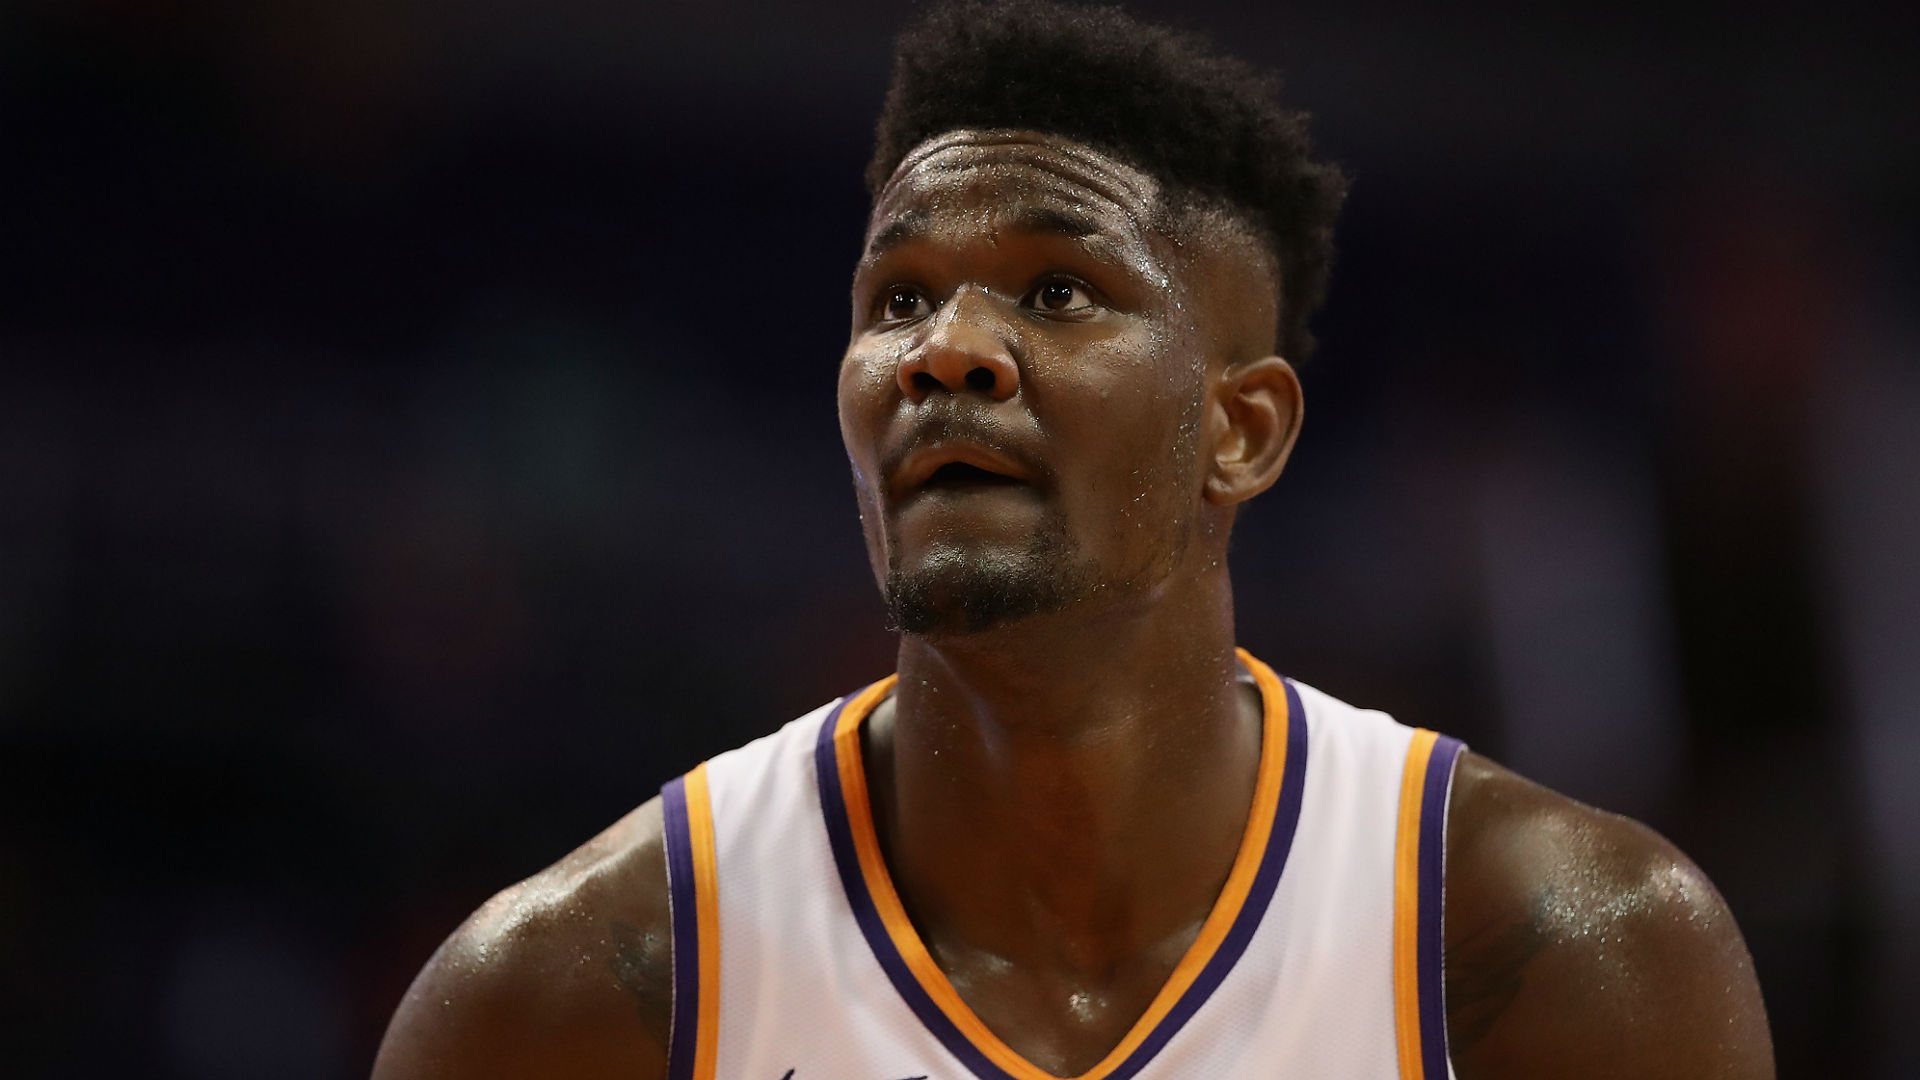 NBA season preview 2018-19: Five rookies to watch